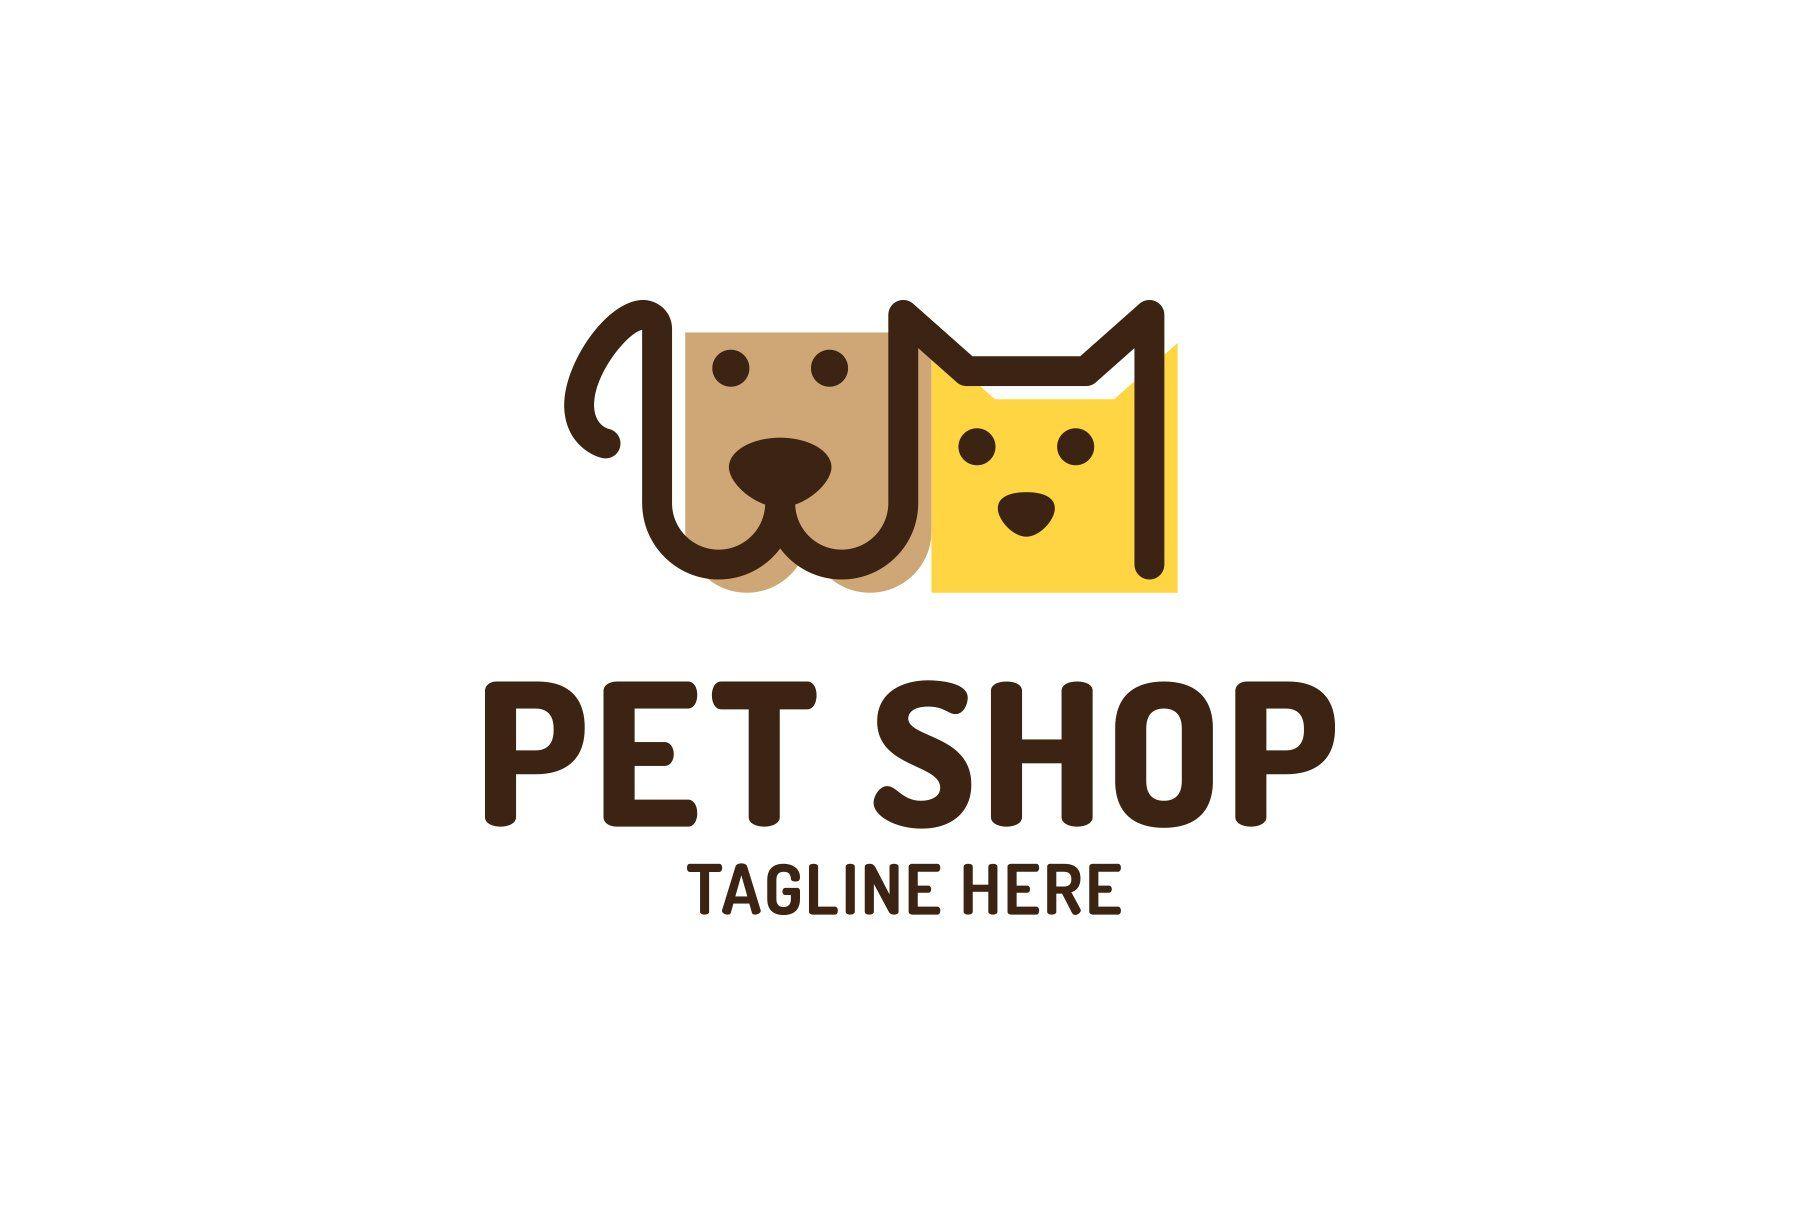 Pet Shop Logo In 2020 Pet Shop Logo Cat Logo Design Pet Shop Logo Design